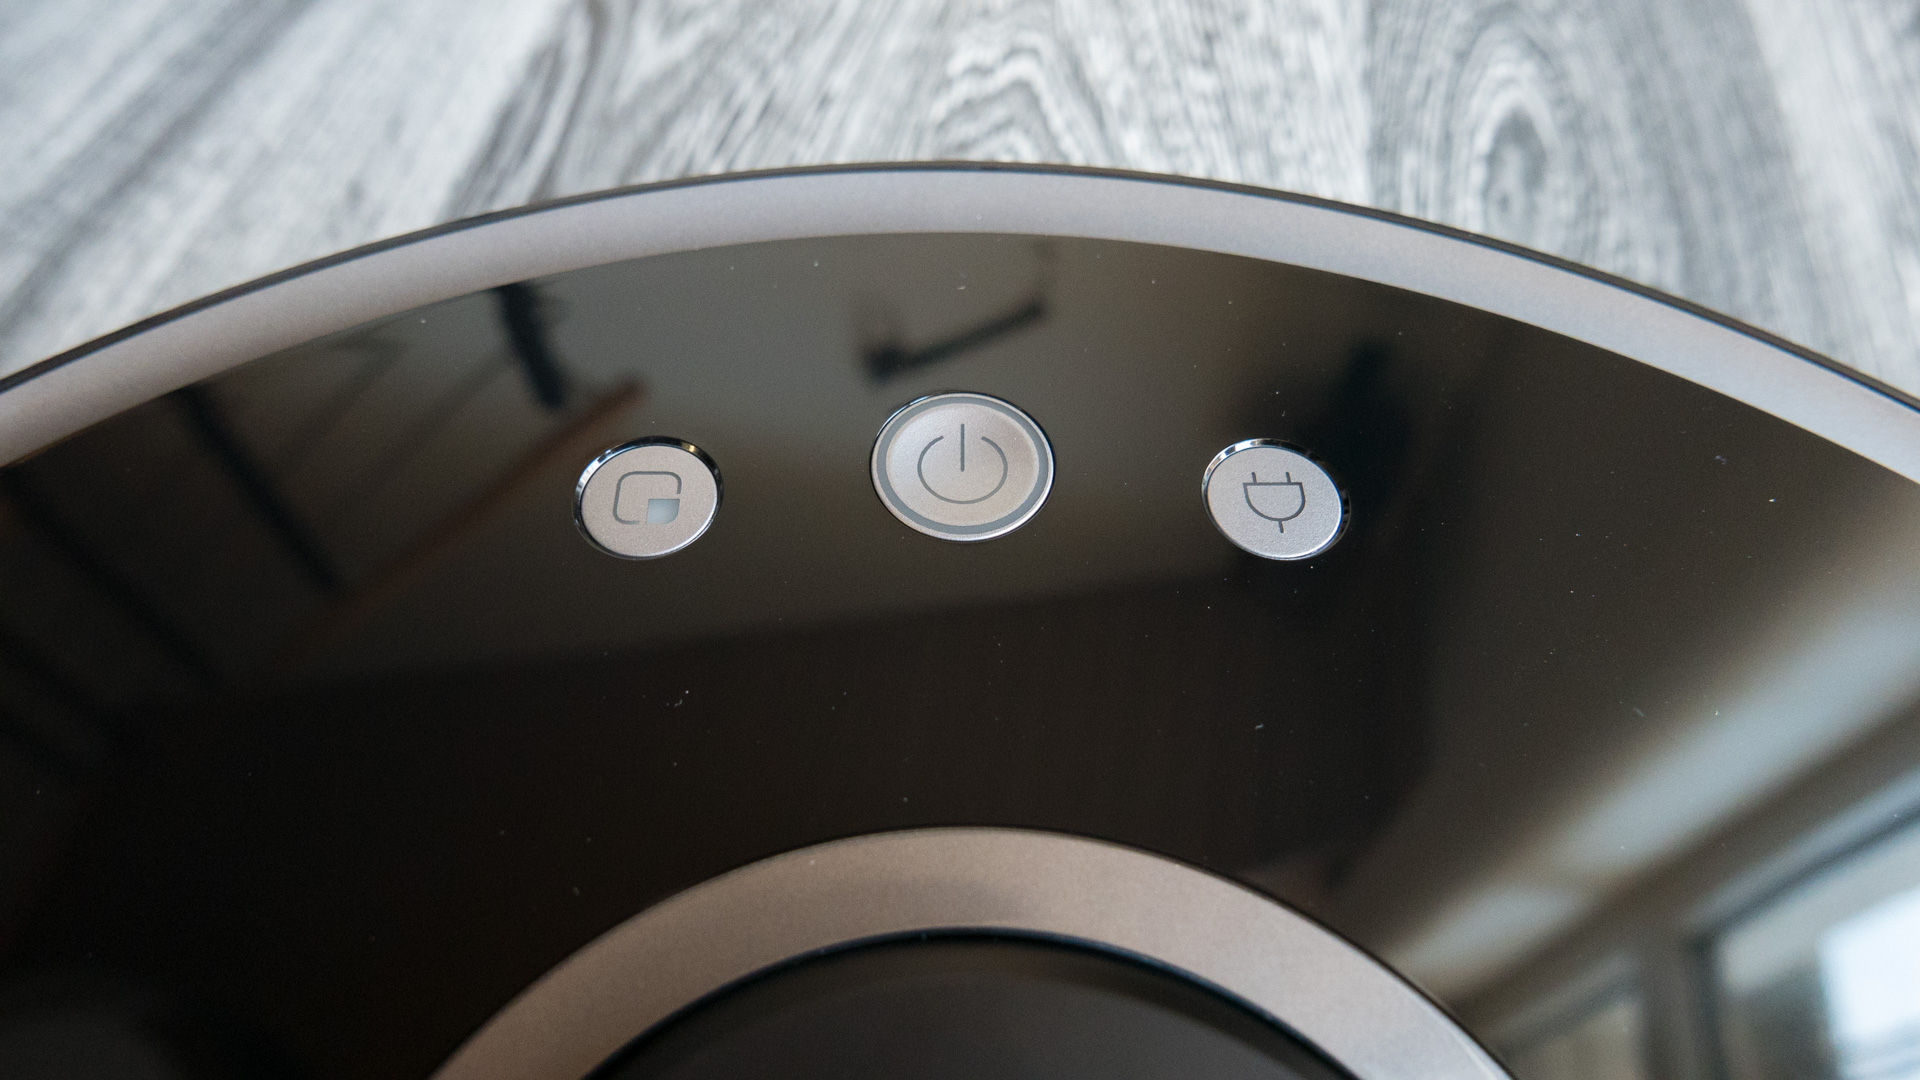 Xiaomi-roborock-S55-Details-4